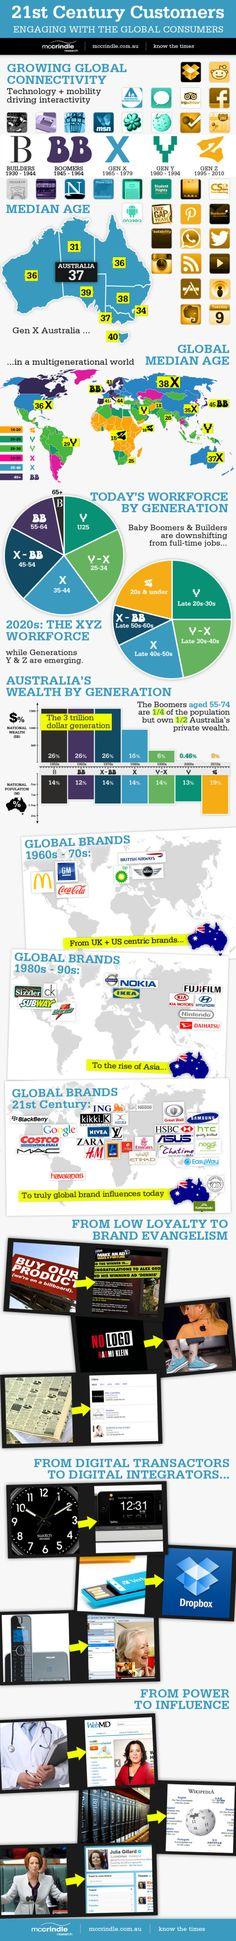 21st Century Customers [INFOGRAPHIC]